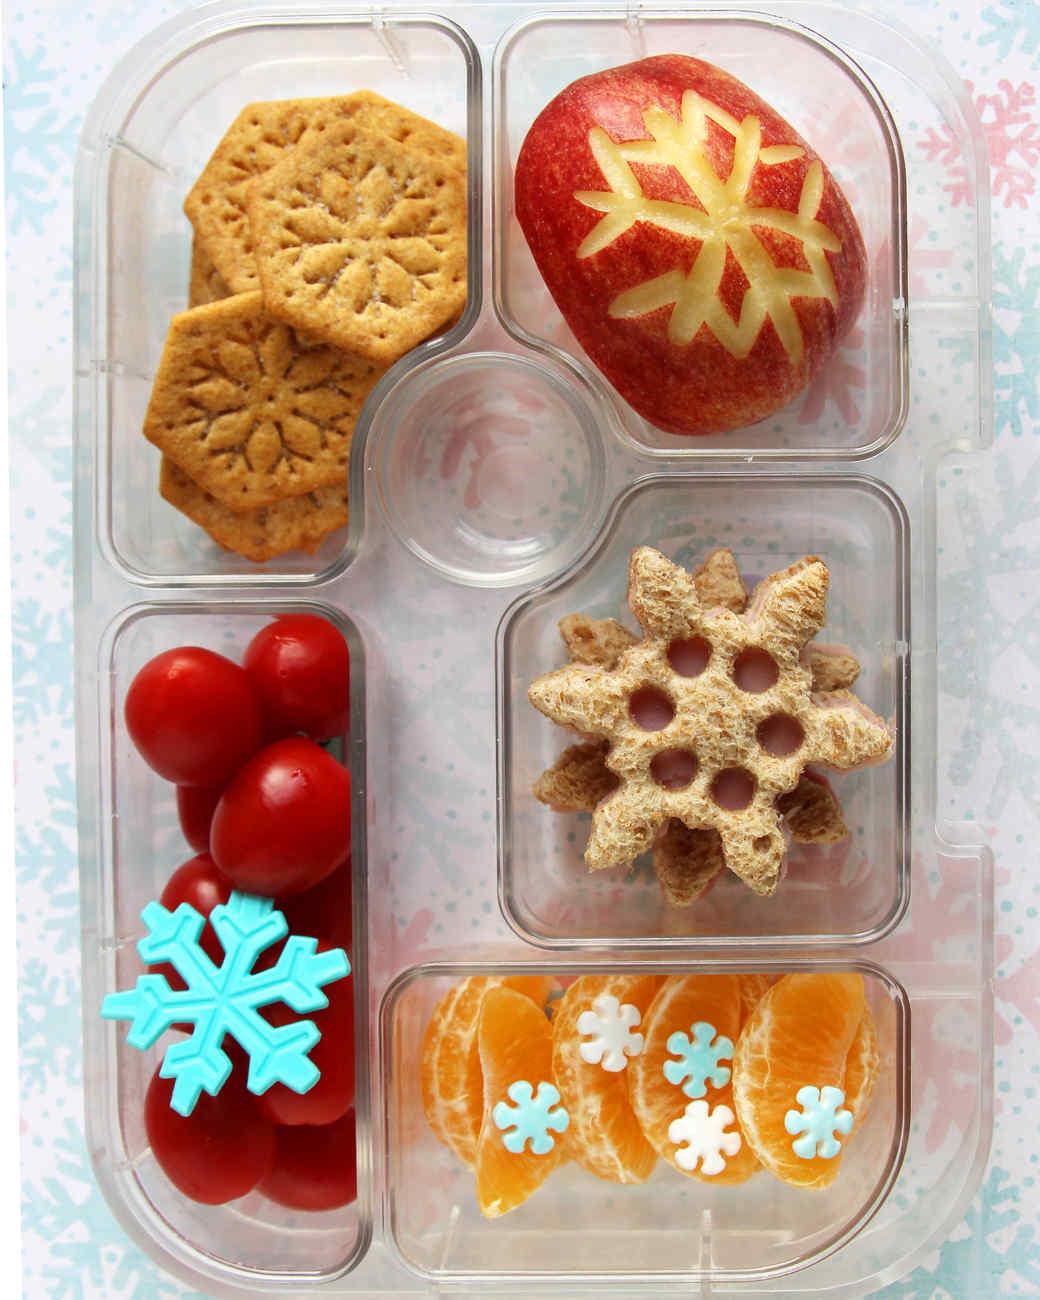 Asian lunch box plates restaurant